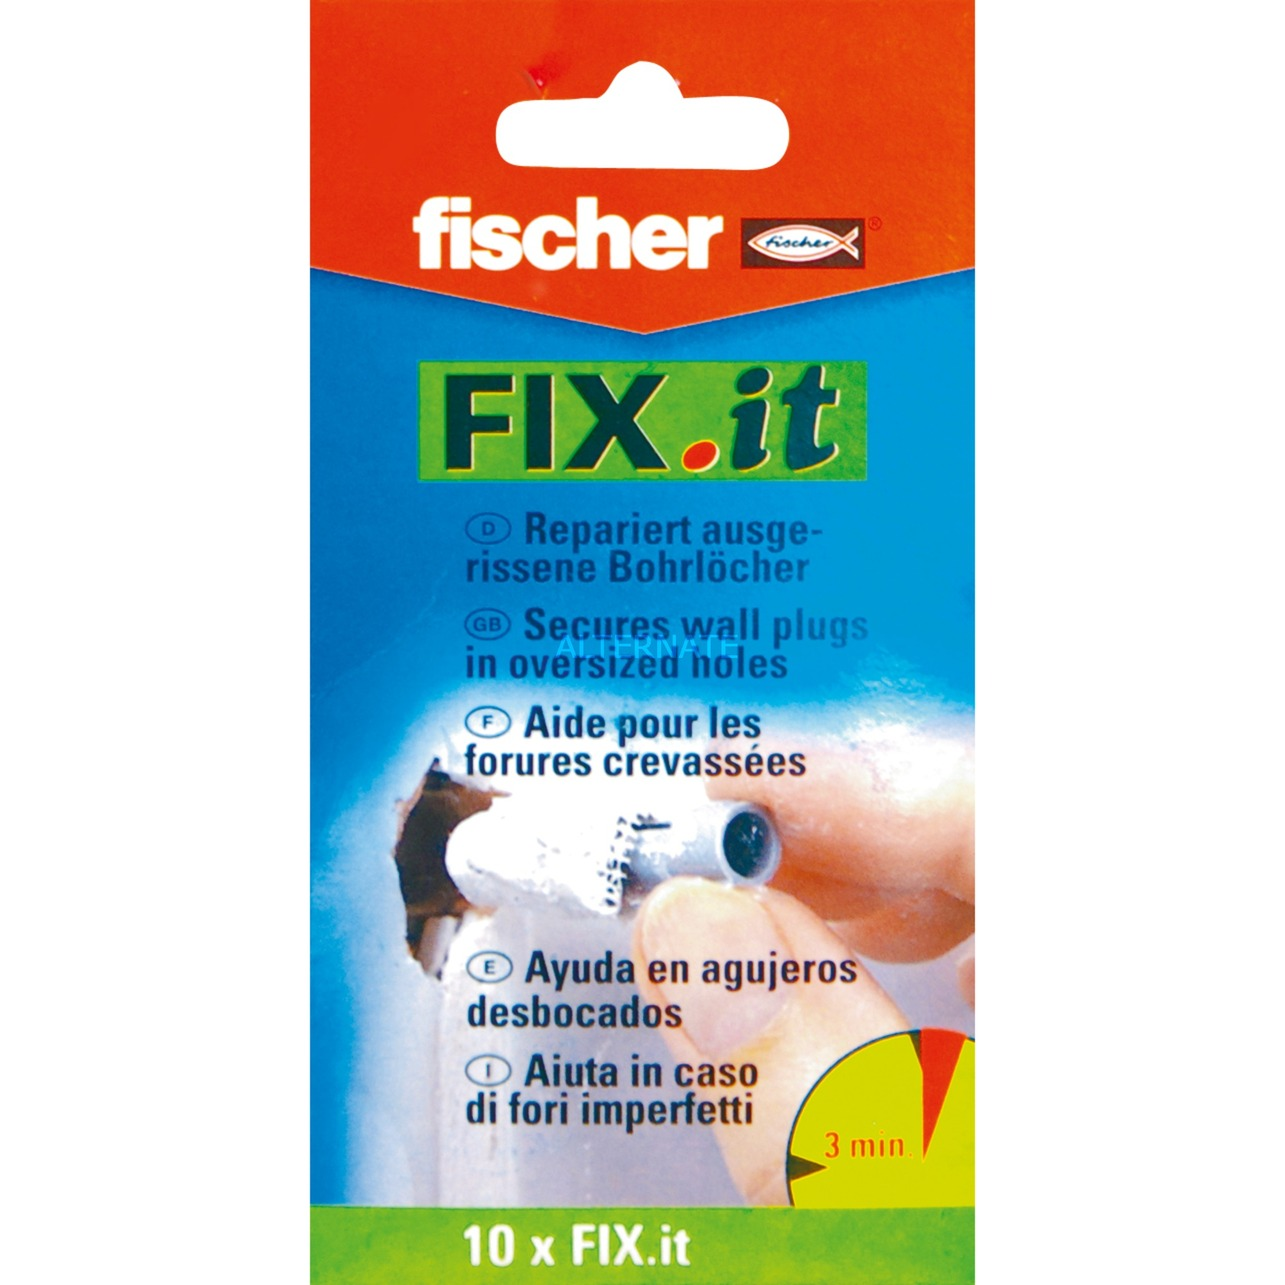 FIX.it, Mortero